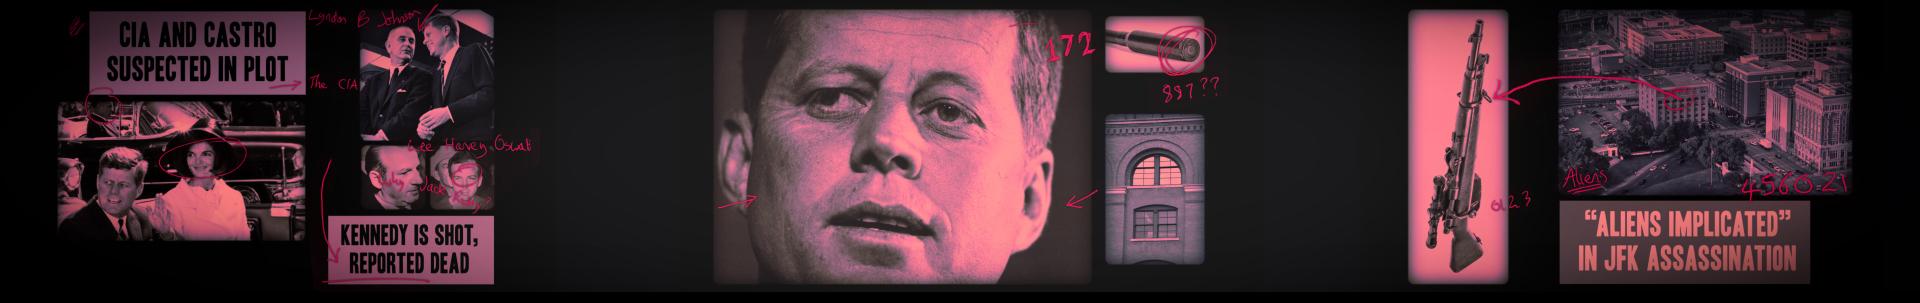 JFK_LED_screen_output.jpg